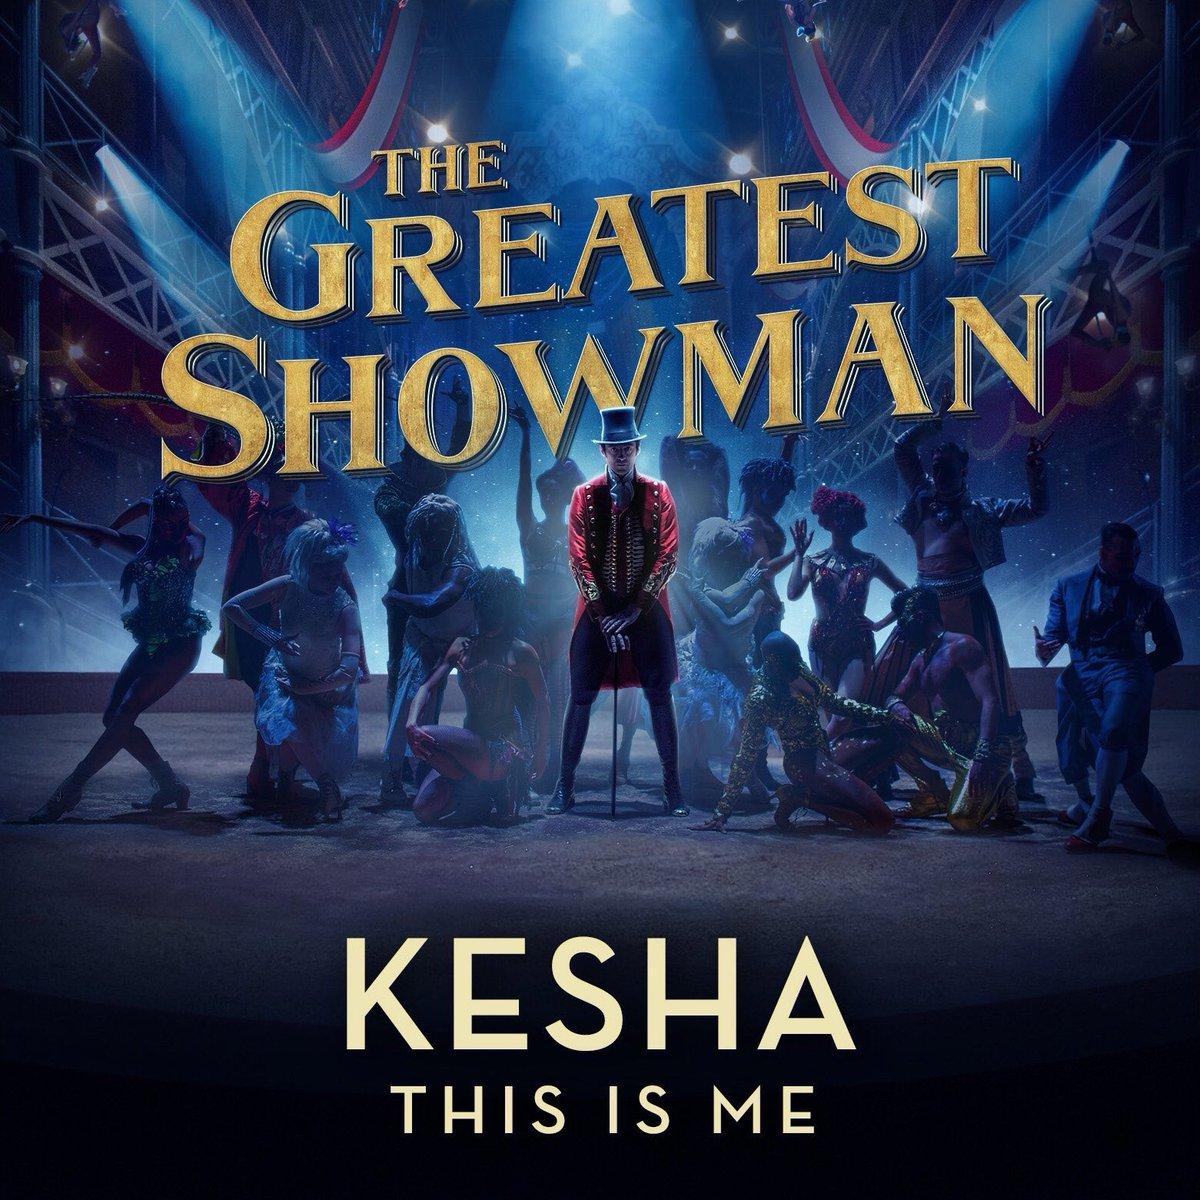 Se revela el próximo sencillo del álbum 'Rainbow' de Kesha